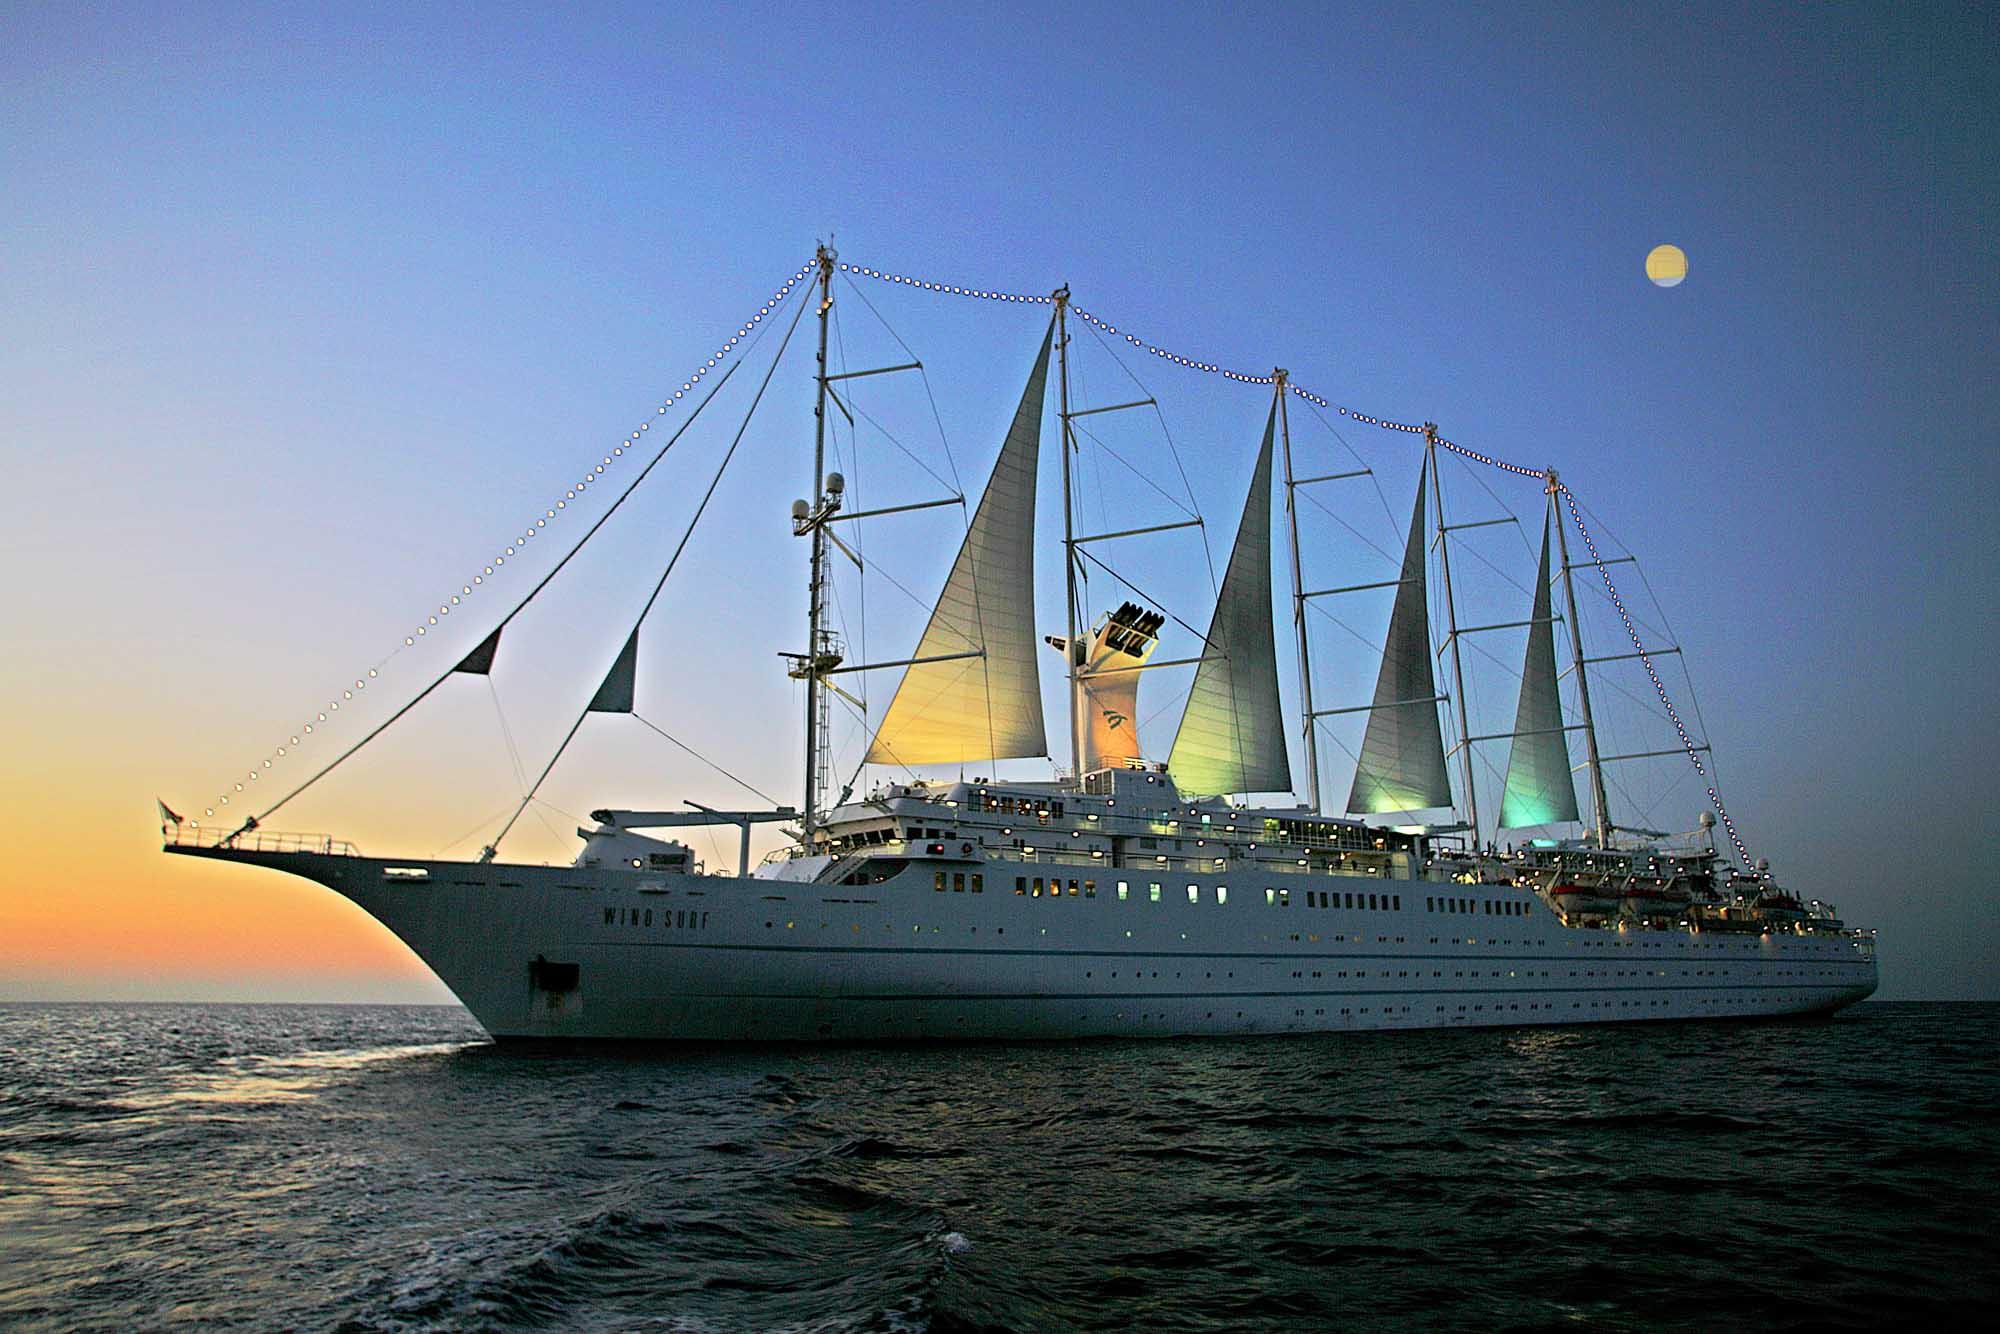 Windstar Cruises Wind Surf Cruise Ship  Cruiseable